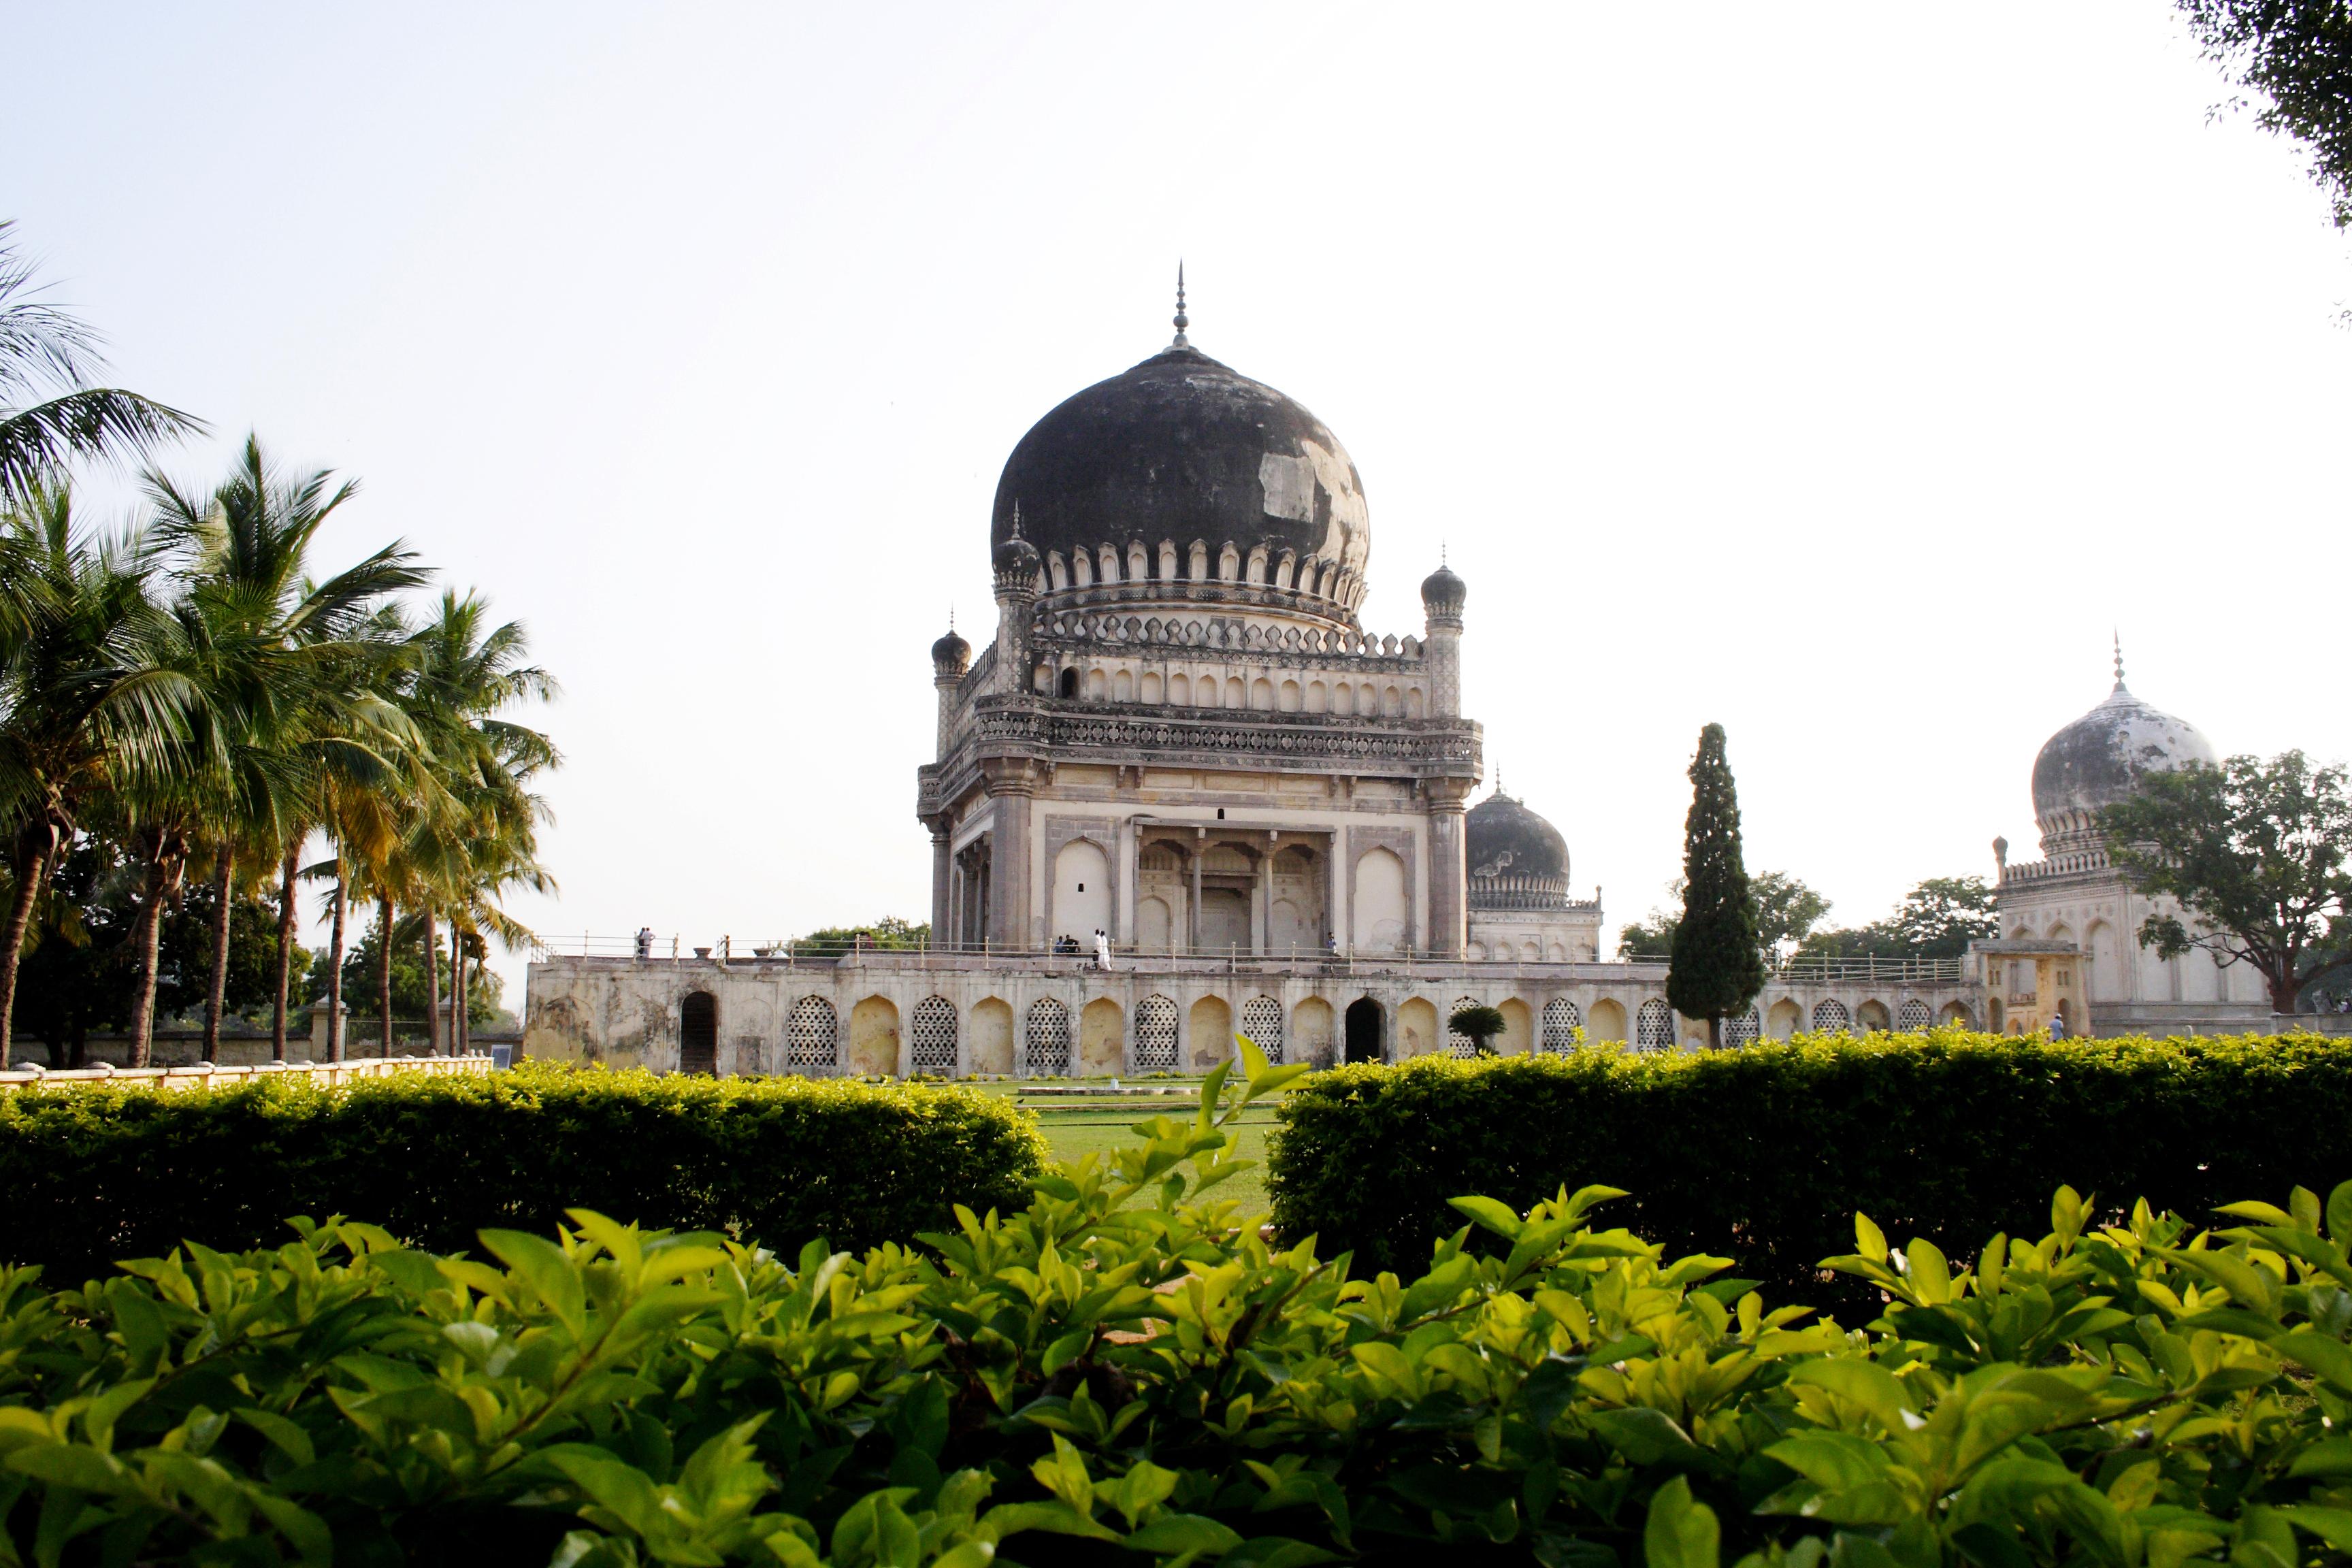 Qutb Shahi Tombs, Hyderabad, India. Photo: iStock